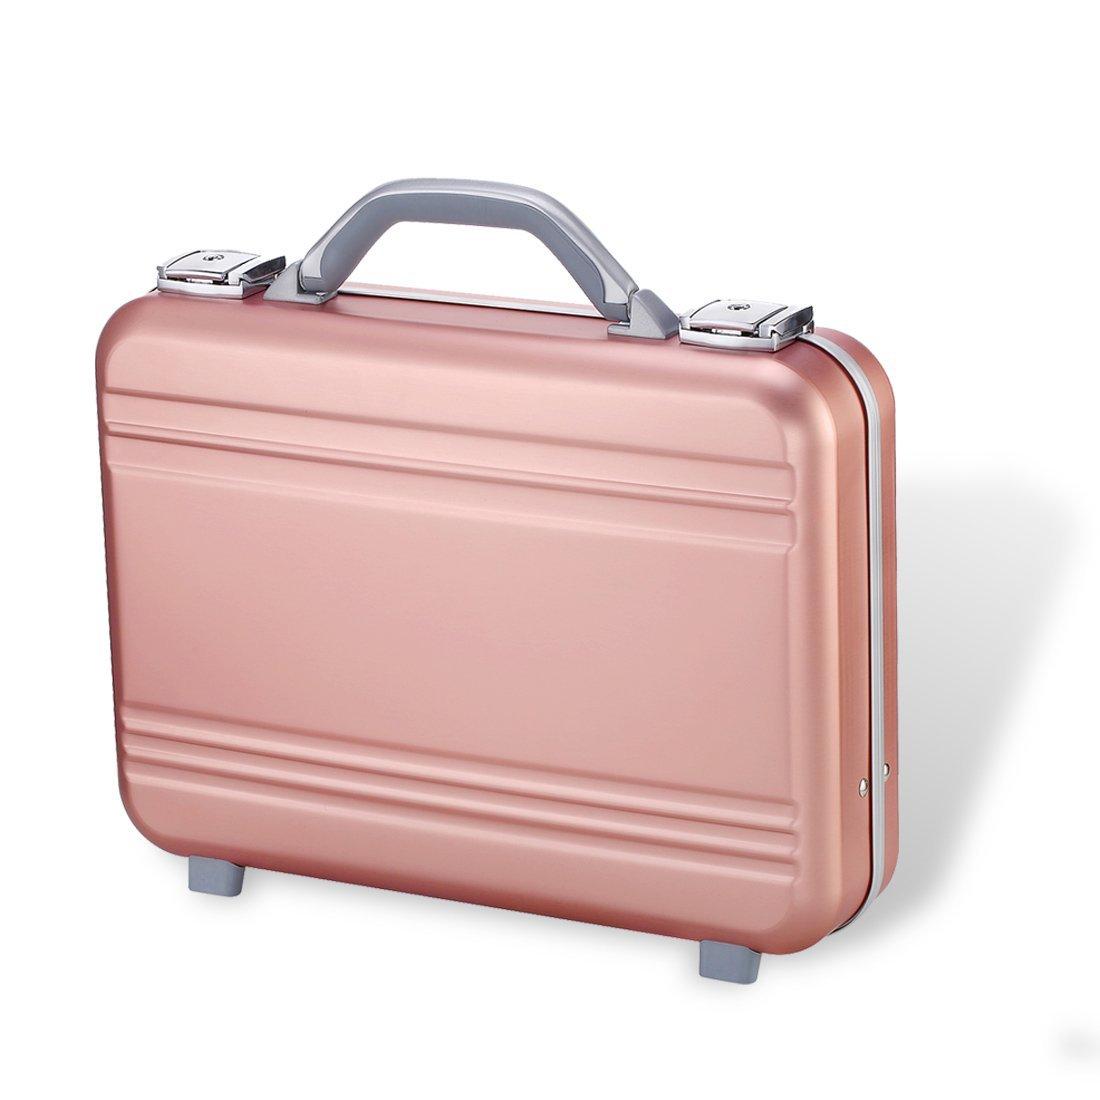 Attache case Metal Aluminum for men women Business foam gun tool writing Organizer Laptop Briefcase small larger silver (Gold, 14.6X10.6X3.7 Inch)